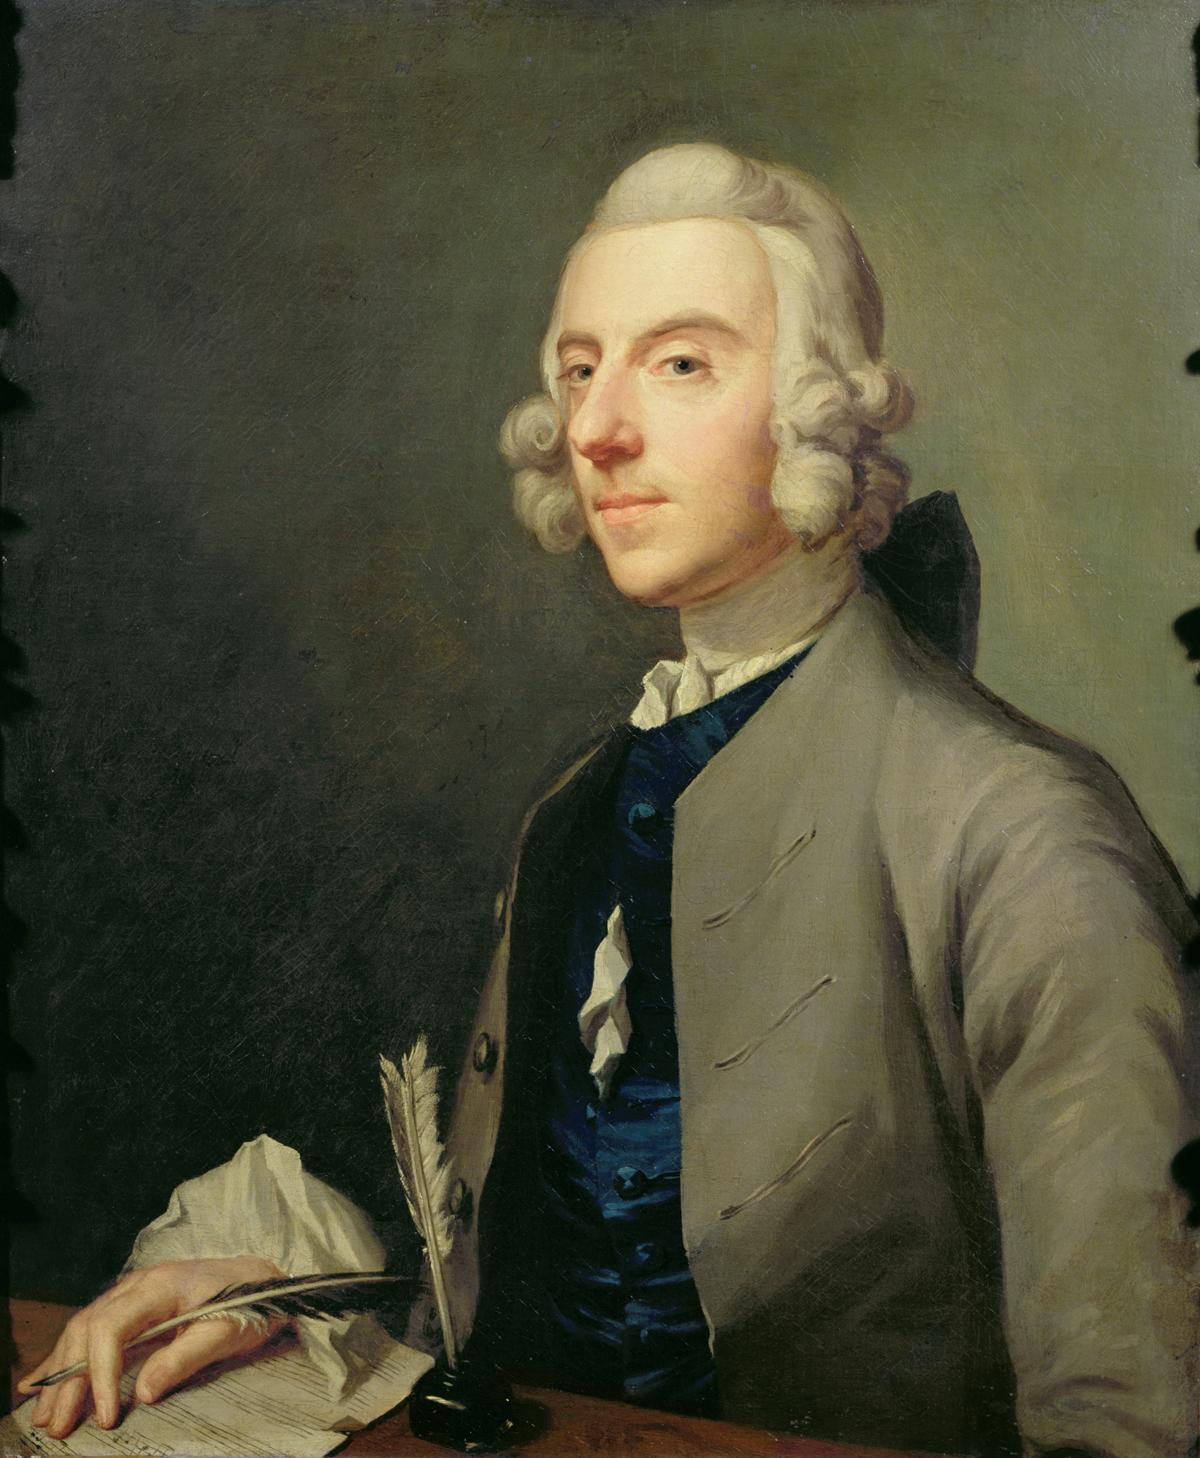 Michael Arne Wikipedia